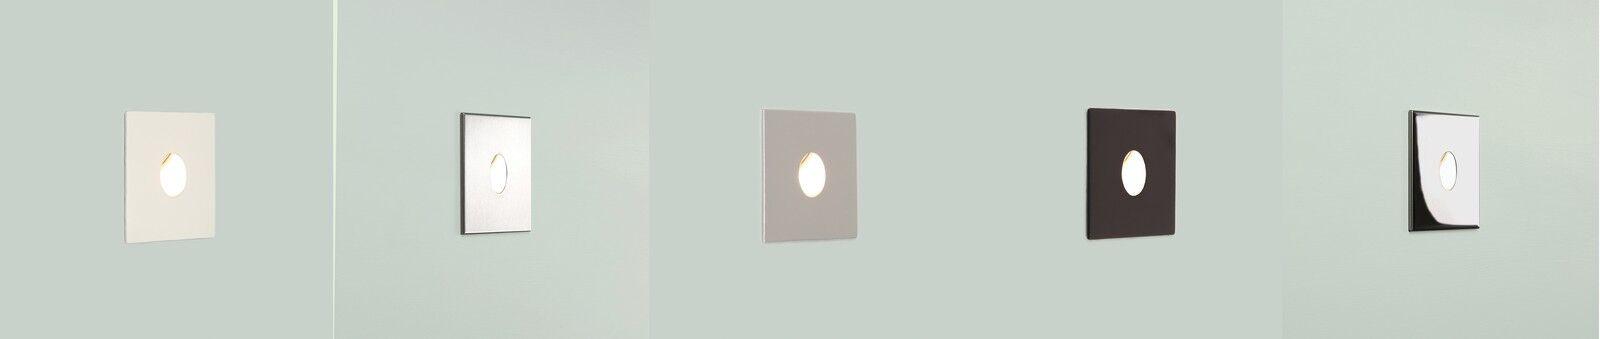 Astro Tango Exterior Led Luz De Parojo De Acero Inoxidable blancoo Pintado Plata Negro